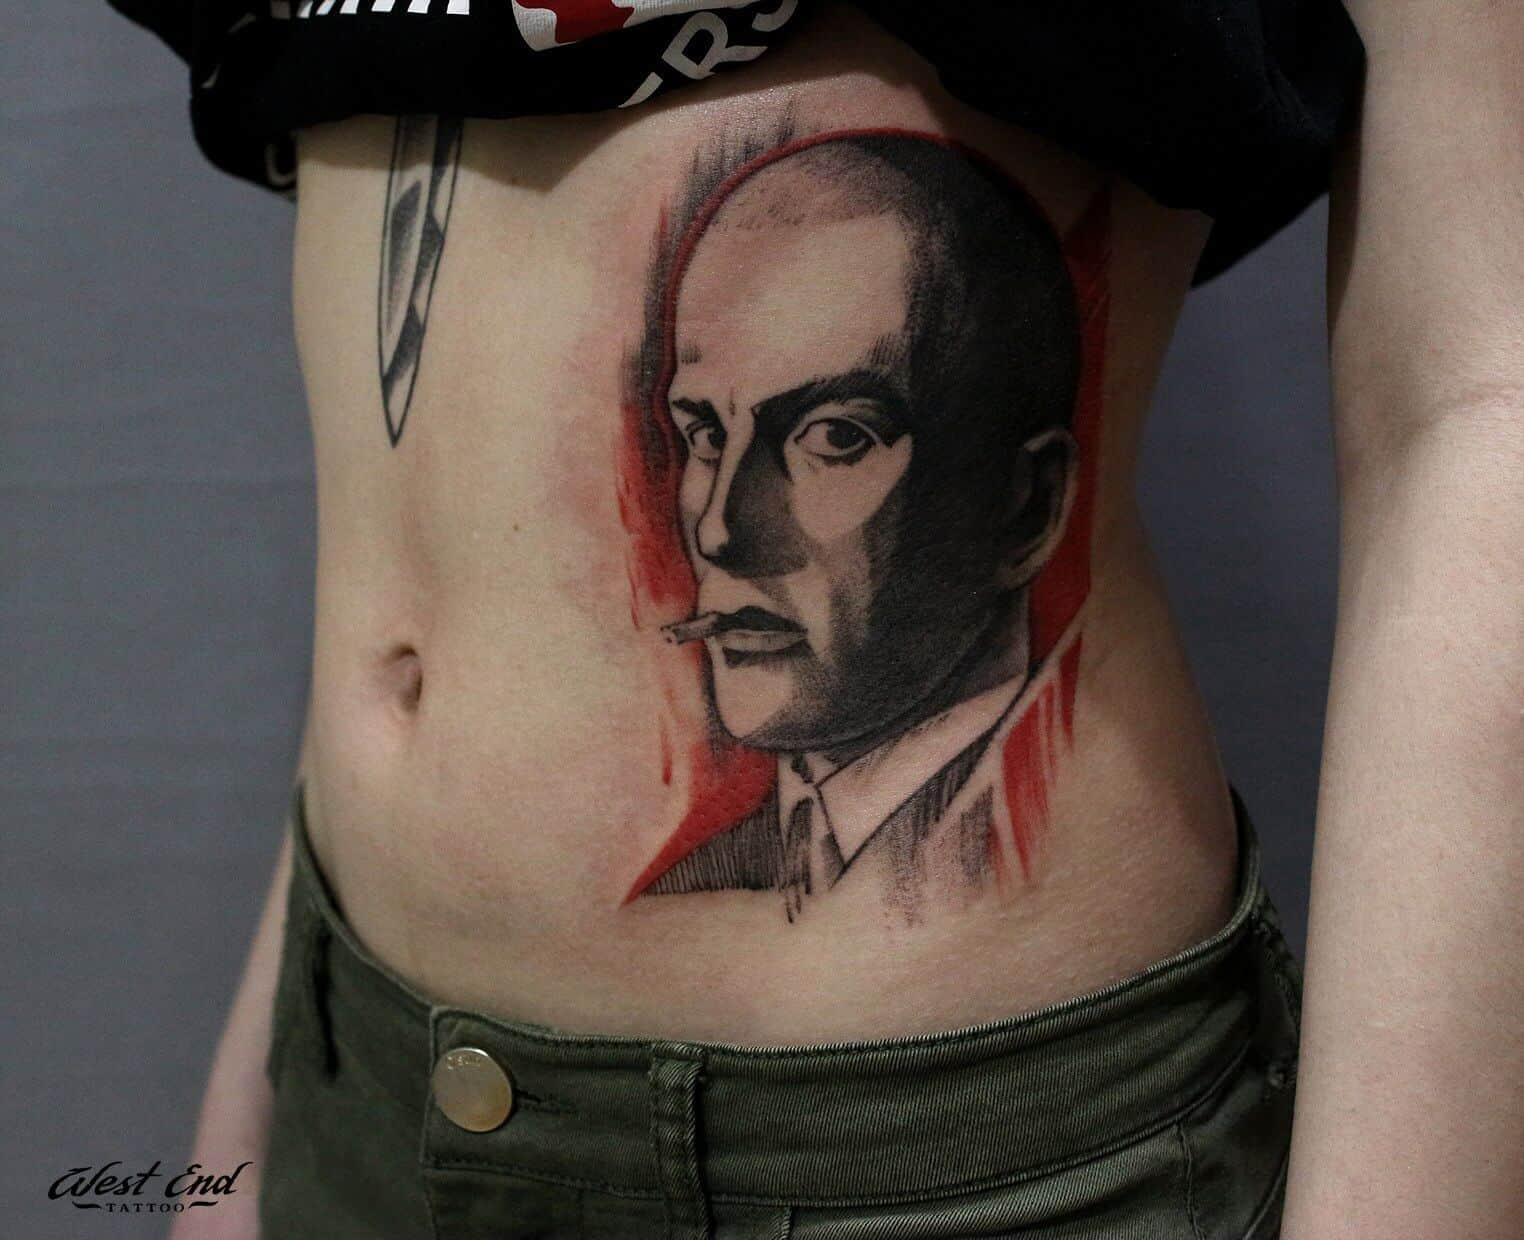 Тату с мужским портретом на боку